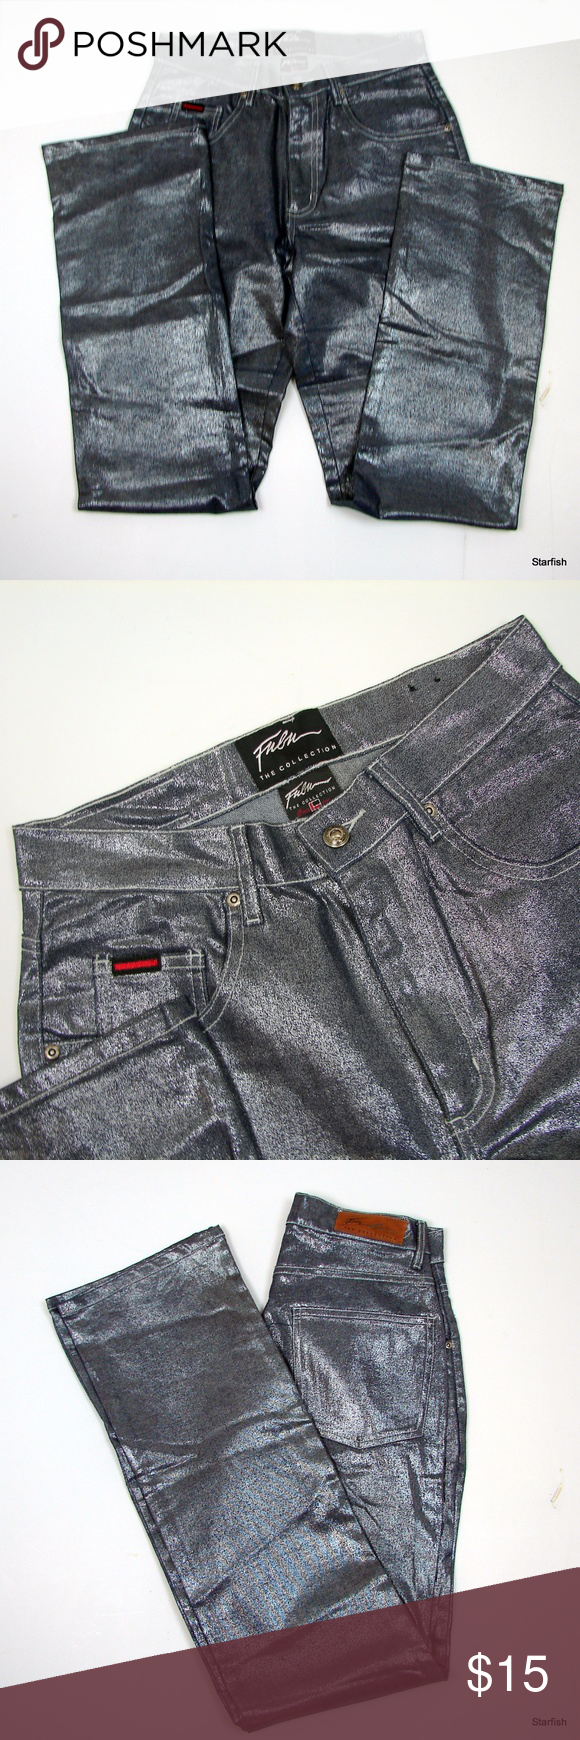 375dafb6 FUBU The Collection metallic jeans 7/8 FUBU The Collection shiney metallic  jeans 7/8. 2% spandex Never worn but so cute! Waist 28-32